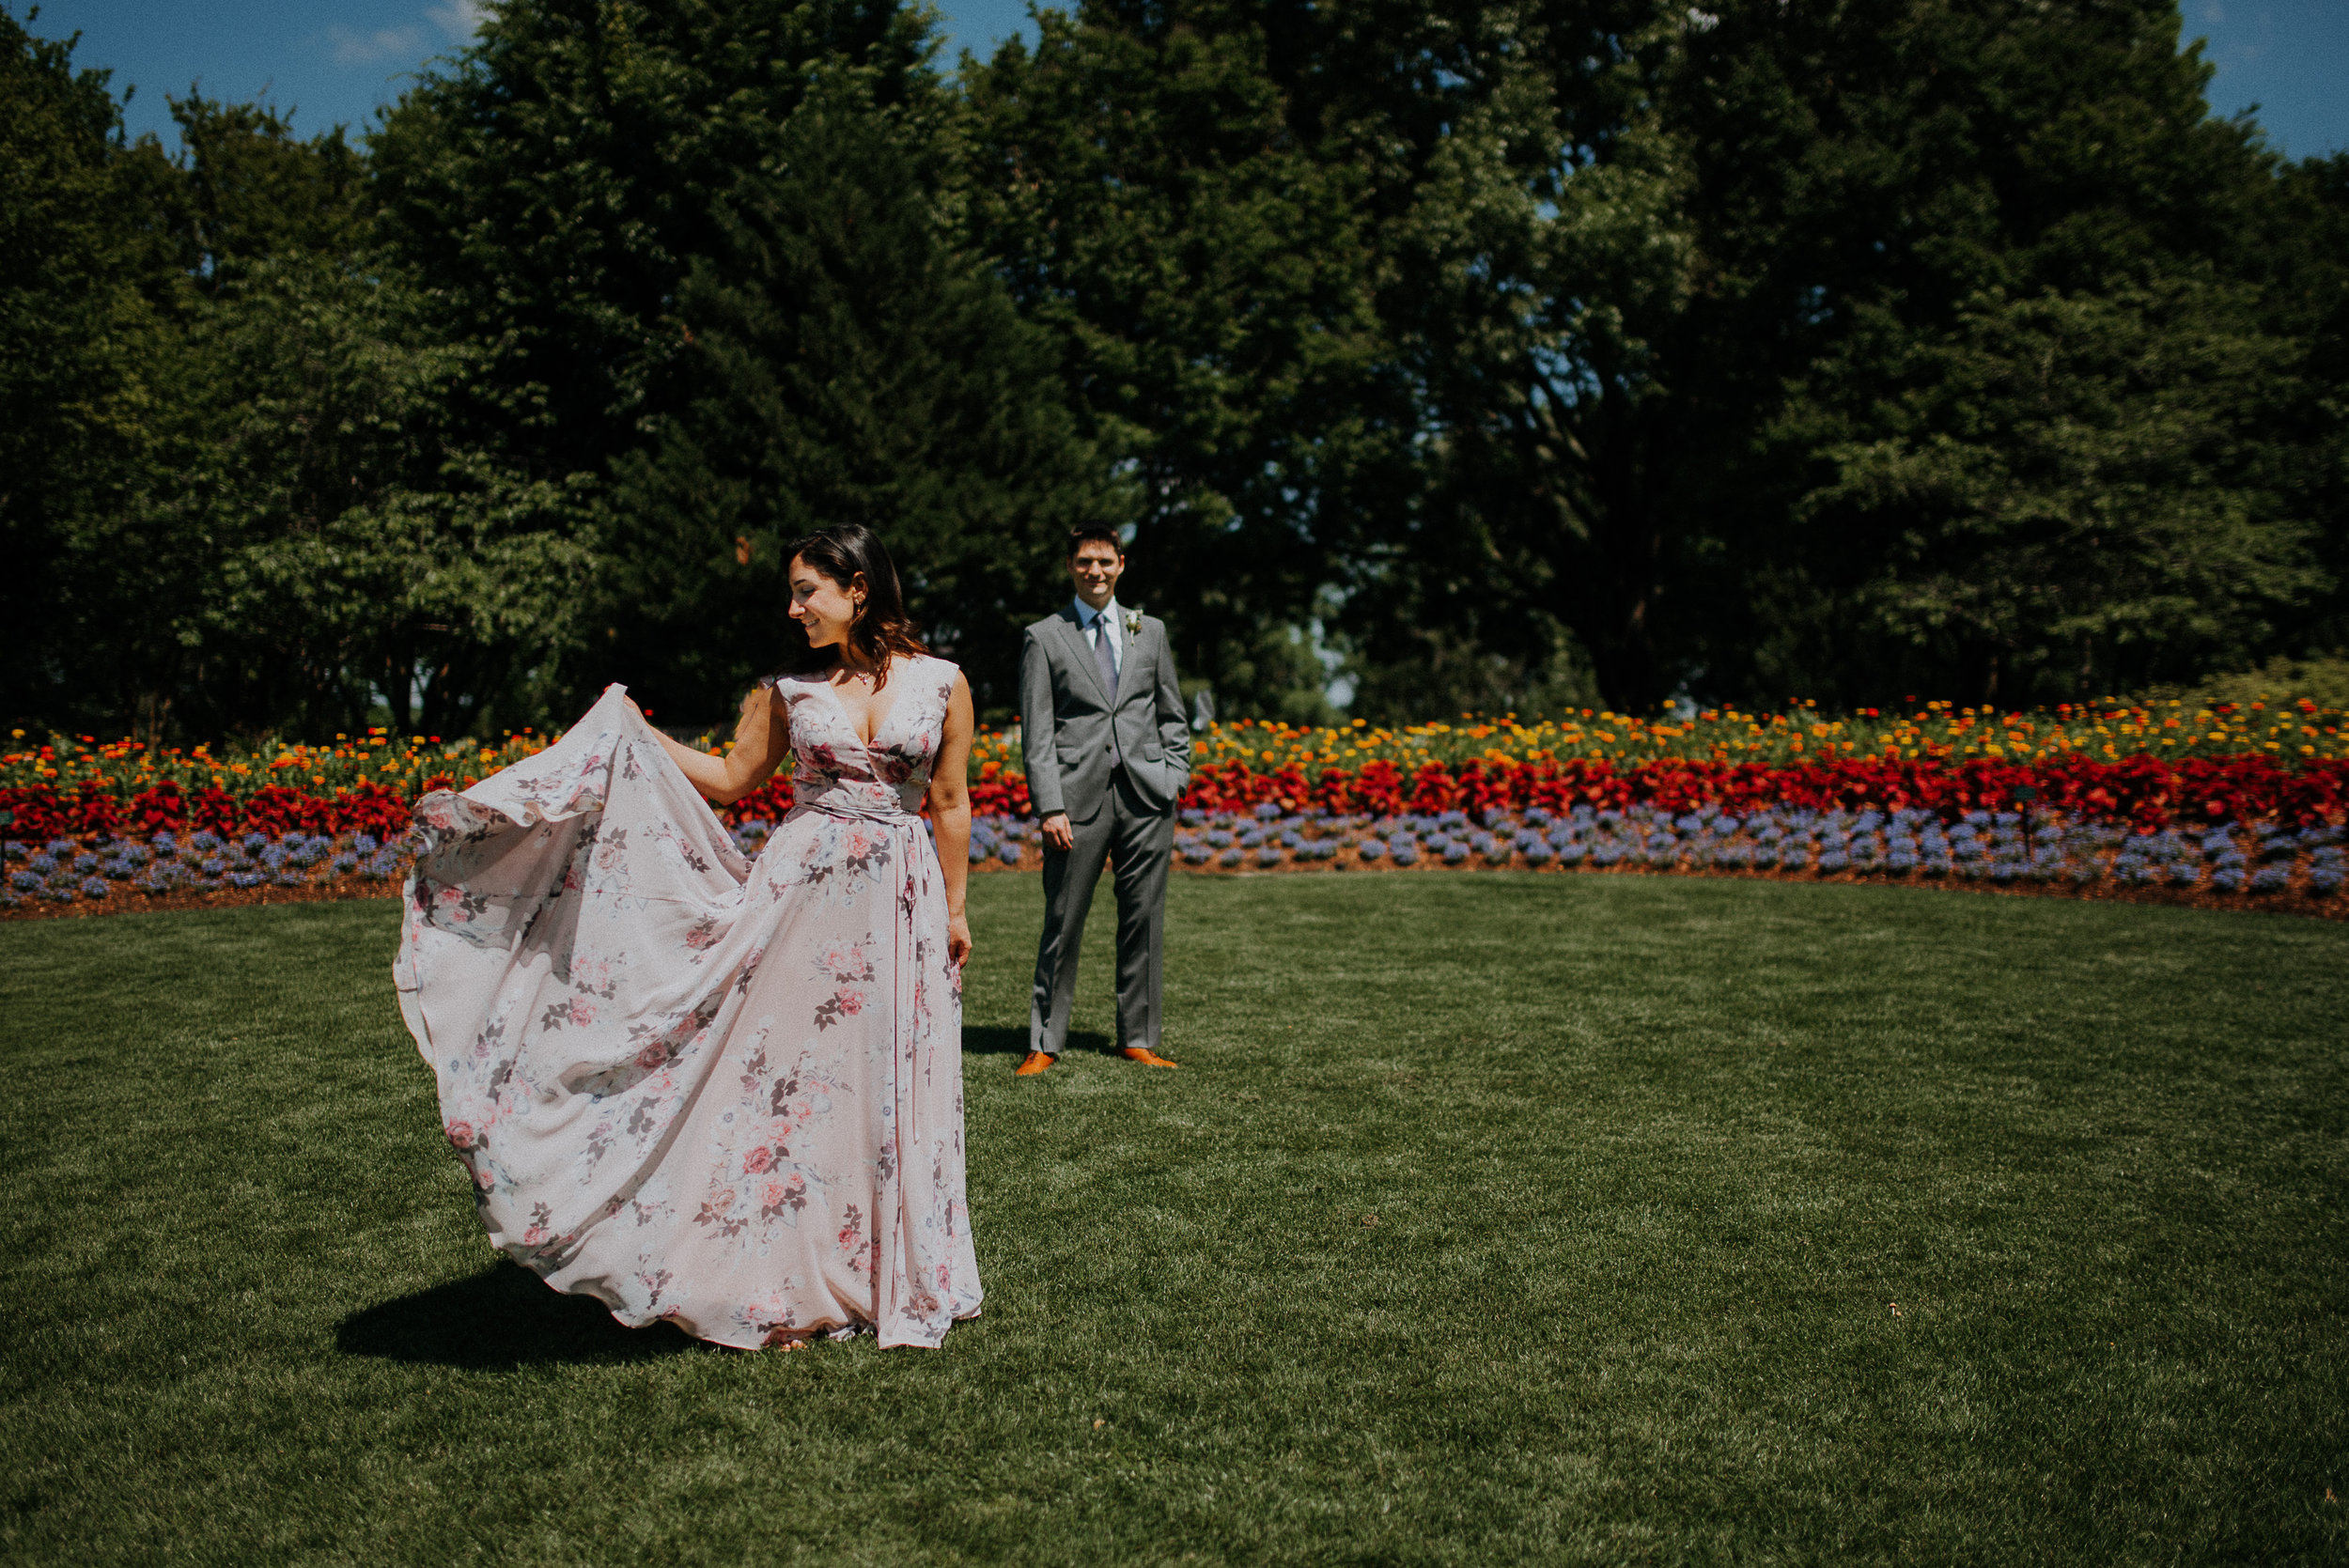 Dallas-fort-worth-wedding-photographer-dallas-arboretum-intimate-wedding-dallas-texas-37